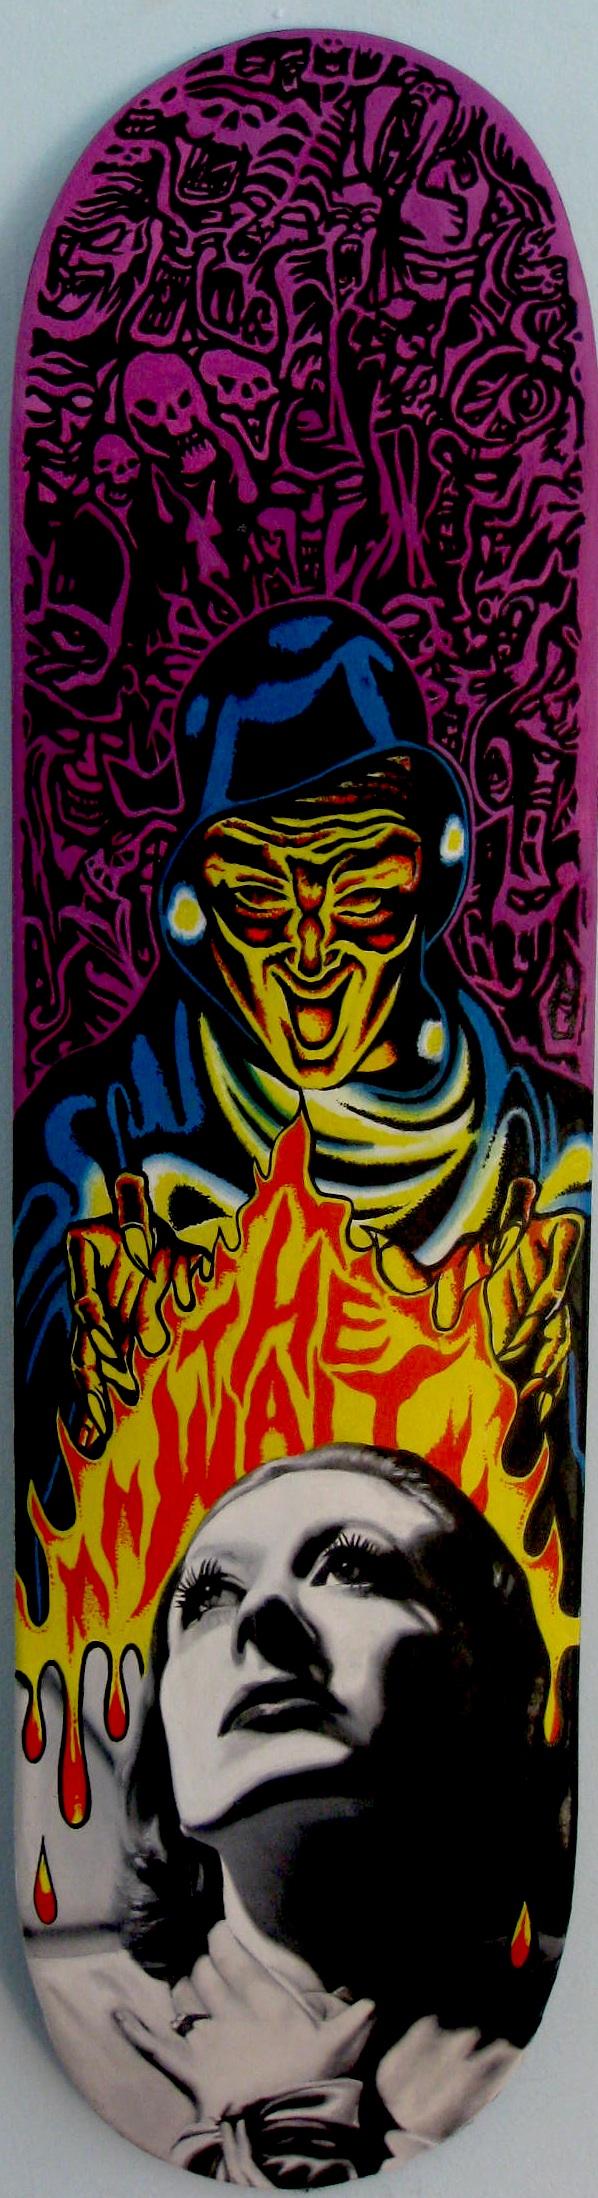 "Jason Bryant, ""Tomorrow"" (2014), oil on skateboard, 31"" x 8"" $1800 USD"